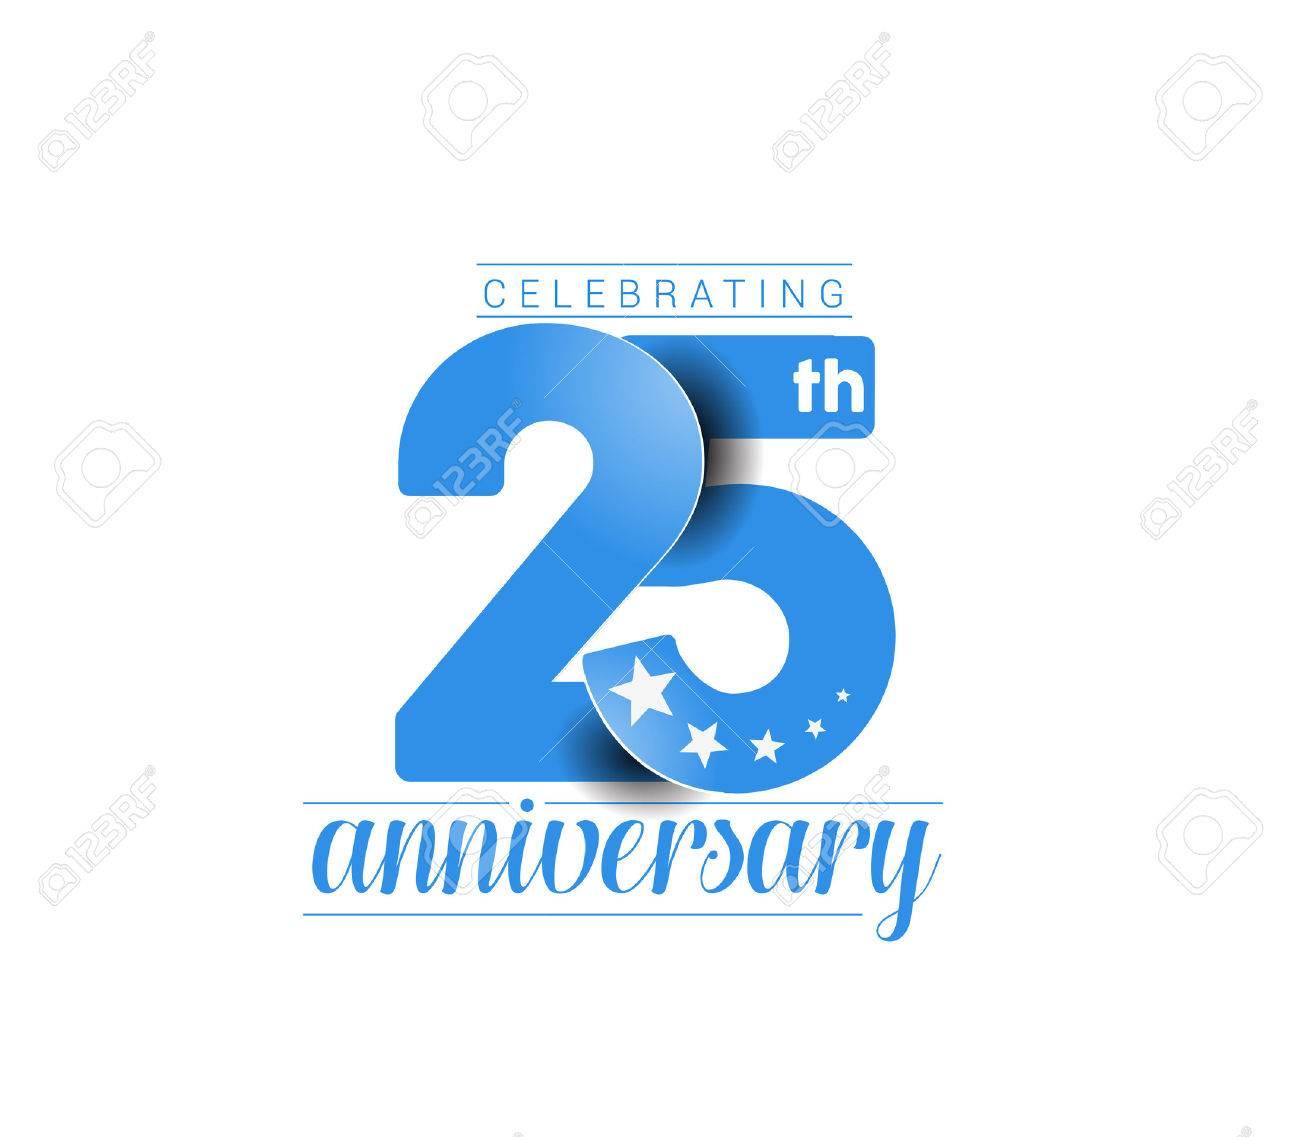 25th Years Anniversary Celebration Design. - 61054928